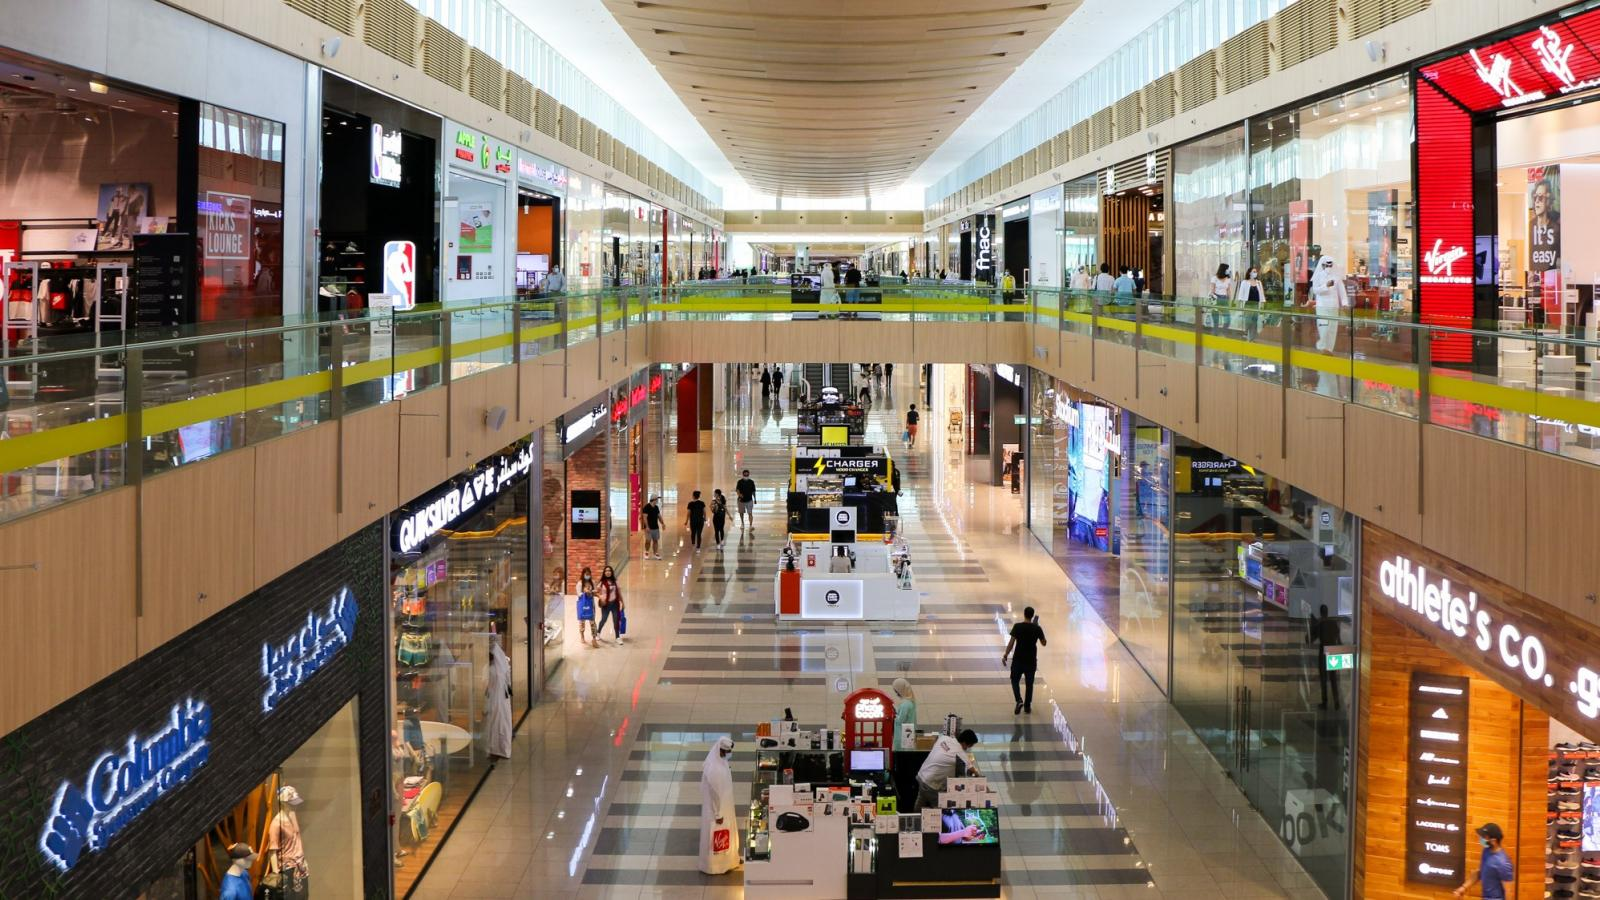 Back to School season kicks off at Doha Festival City